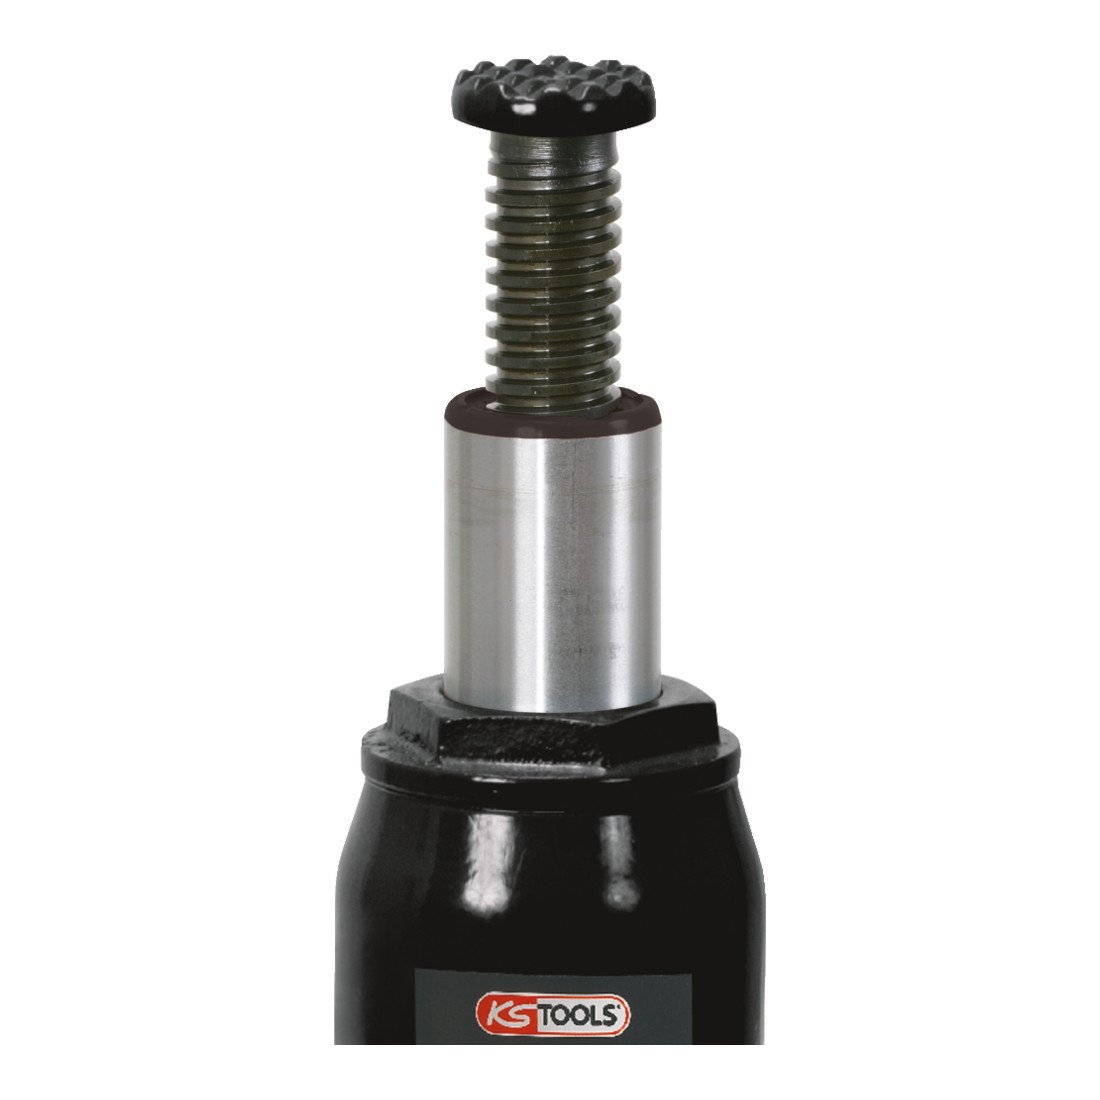 KS Tools 160.0356  Hydraulic bottle jack, 15t 4042146118245